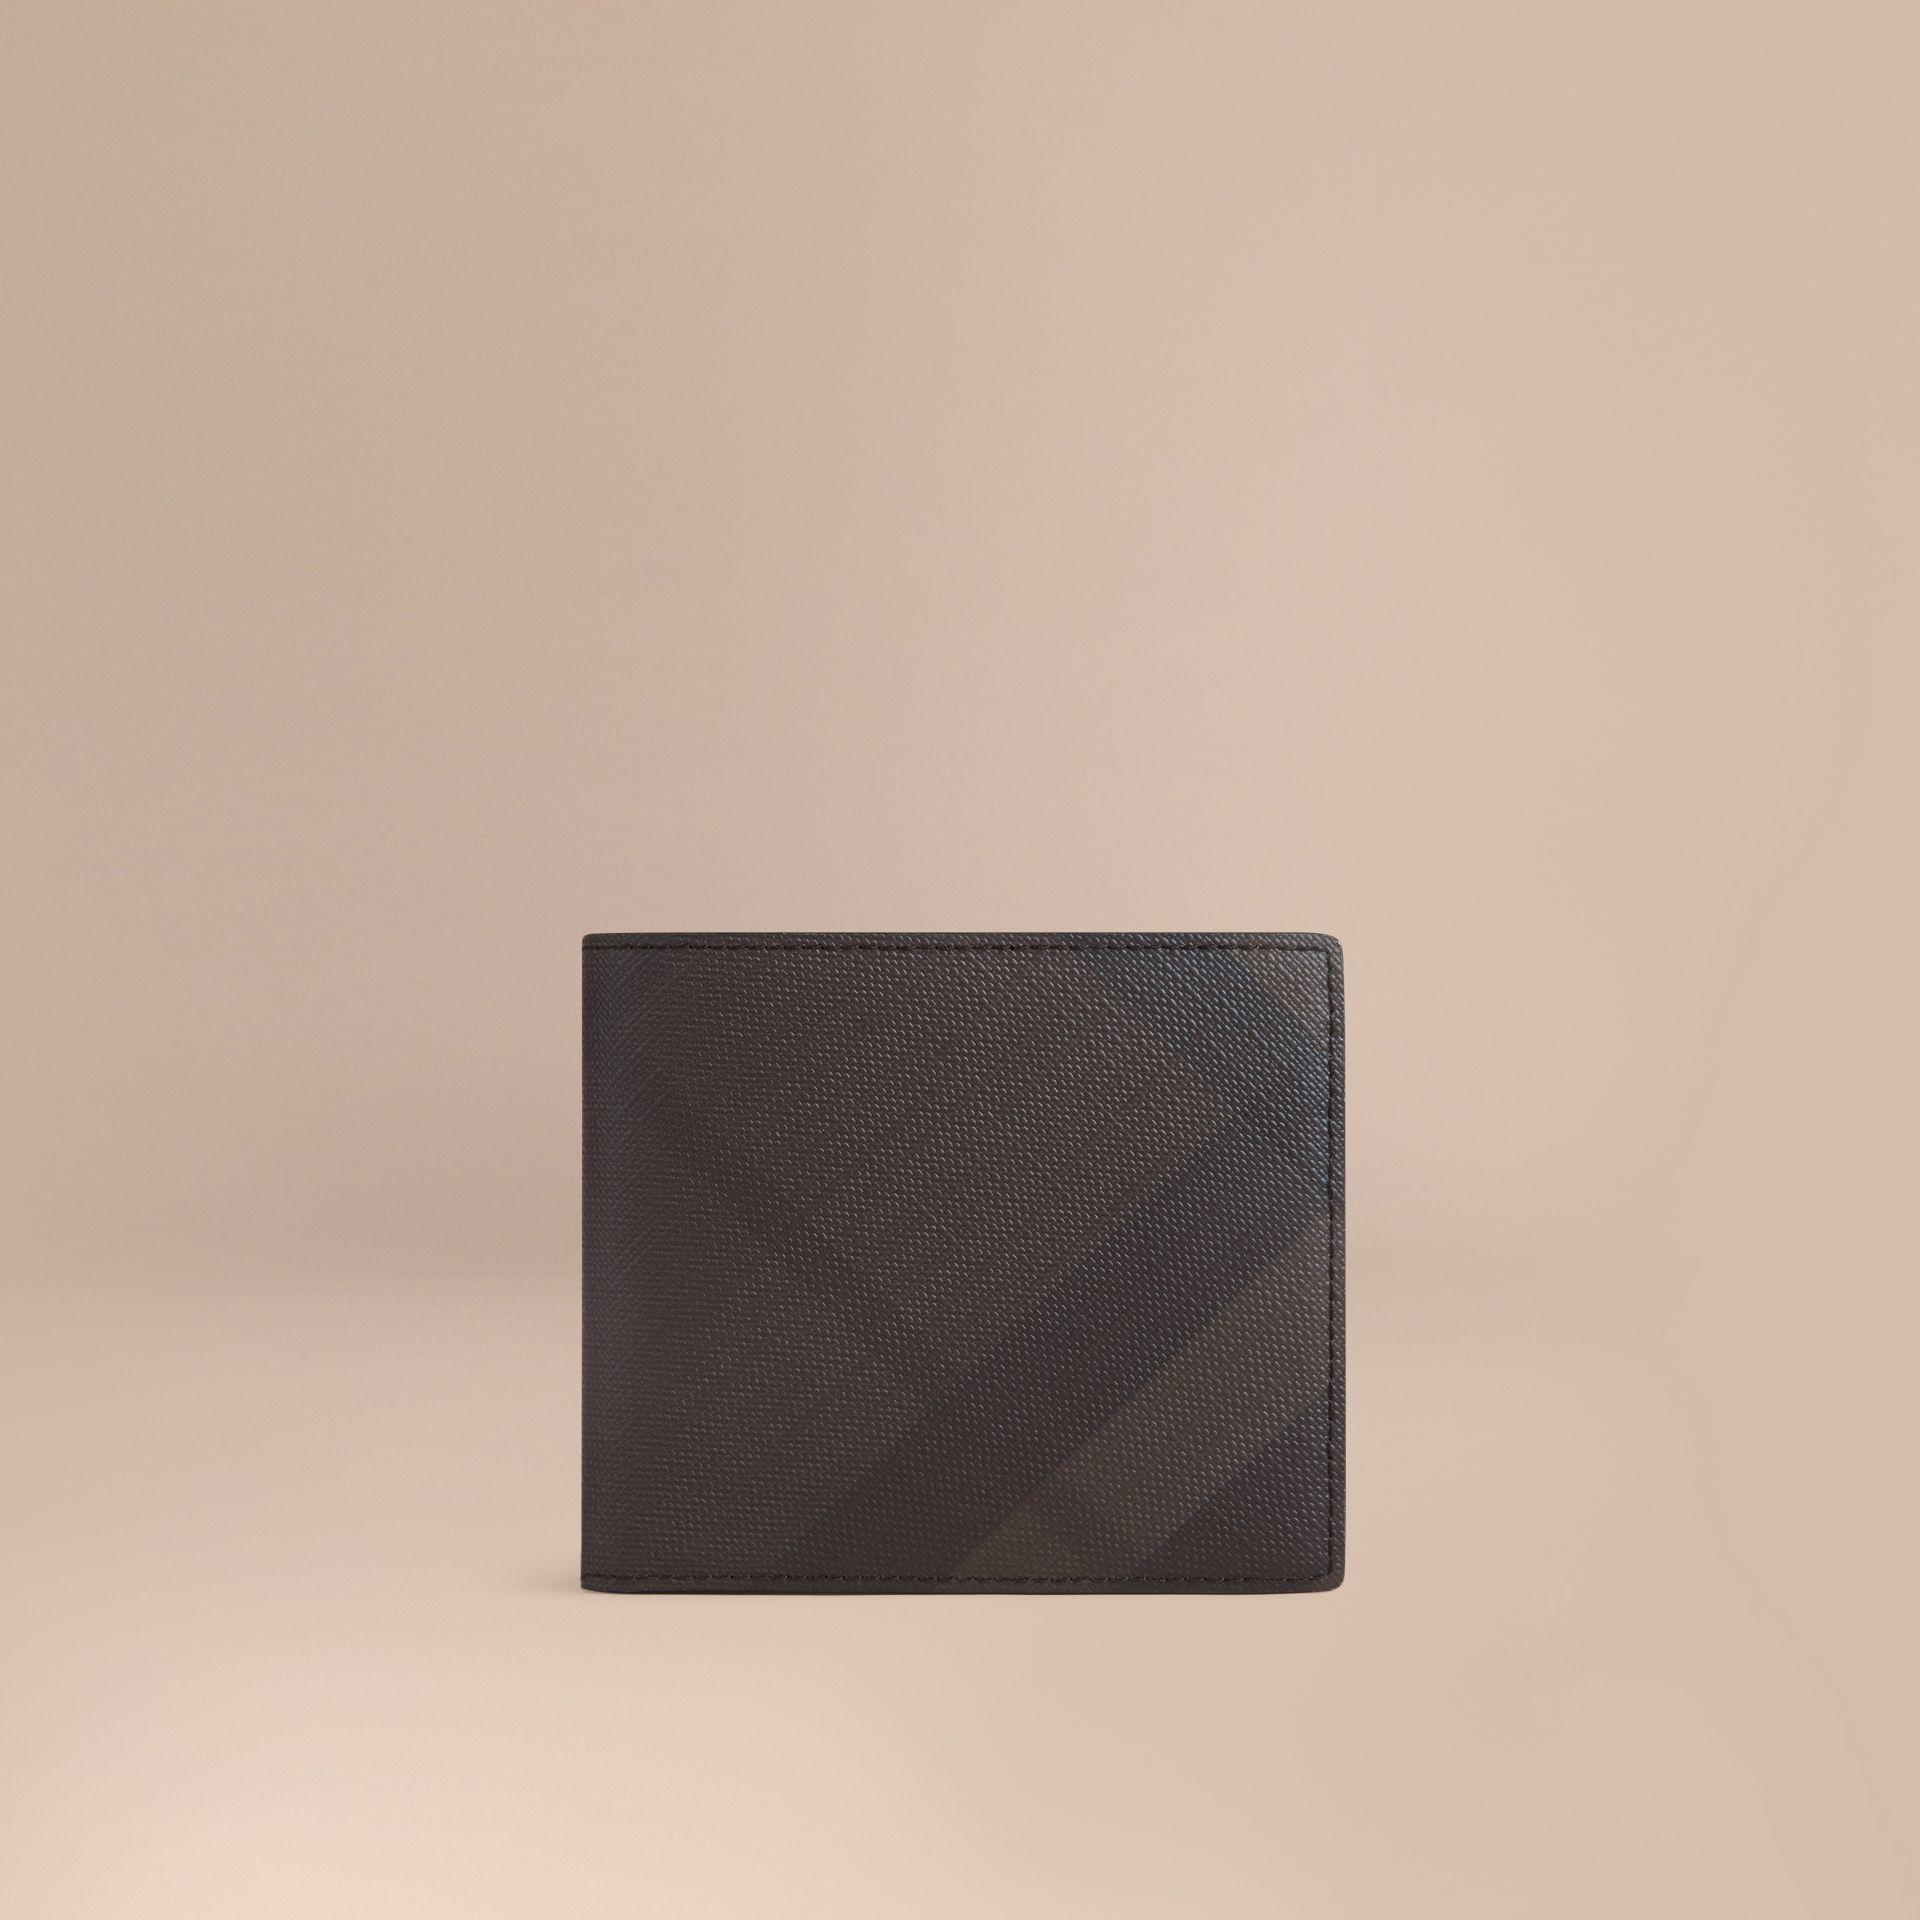 Burberry 런던 체크 바이폴드 코인 지갑 In Chocolate/black